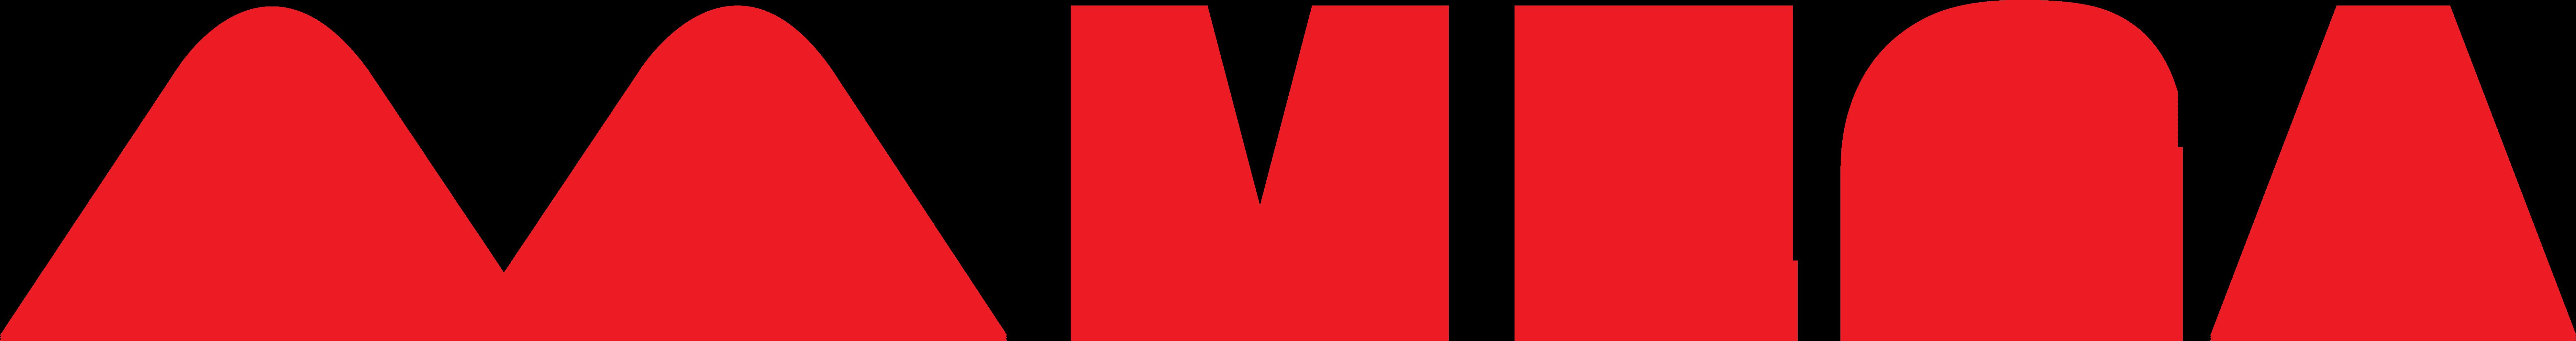 Mega Access Specialist Sdn Bhd | Malaysia Aluminium Scaffolding Supplier | Malaysia Scaffolding Rental | Malaysia Scaffolding